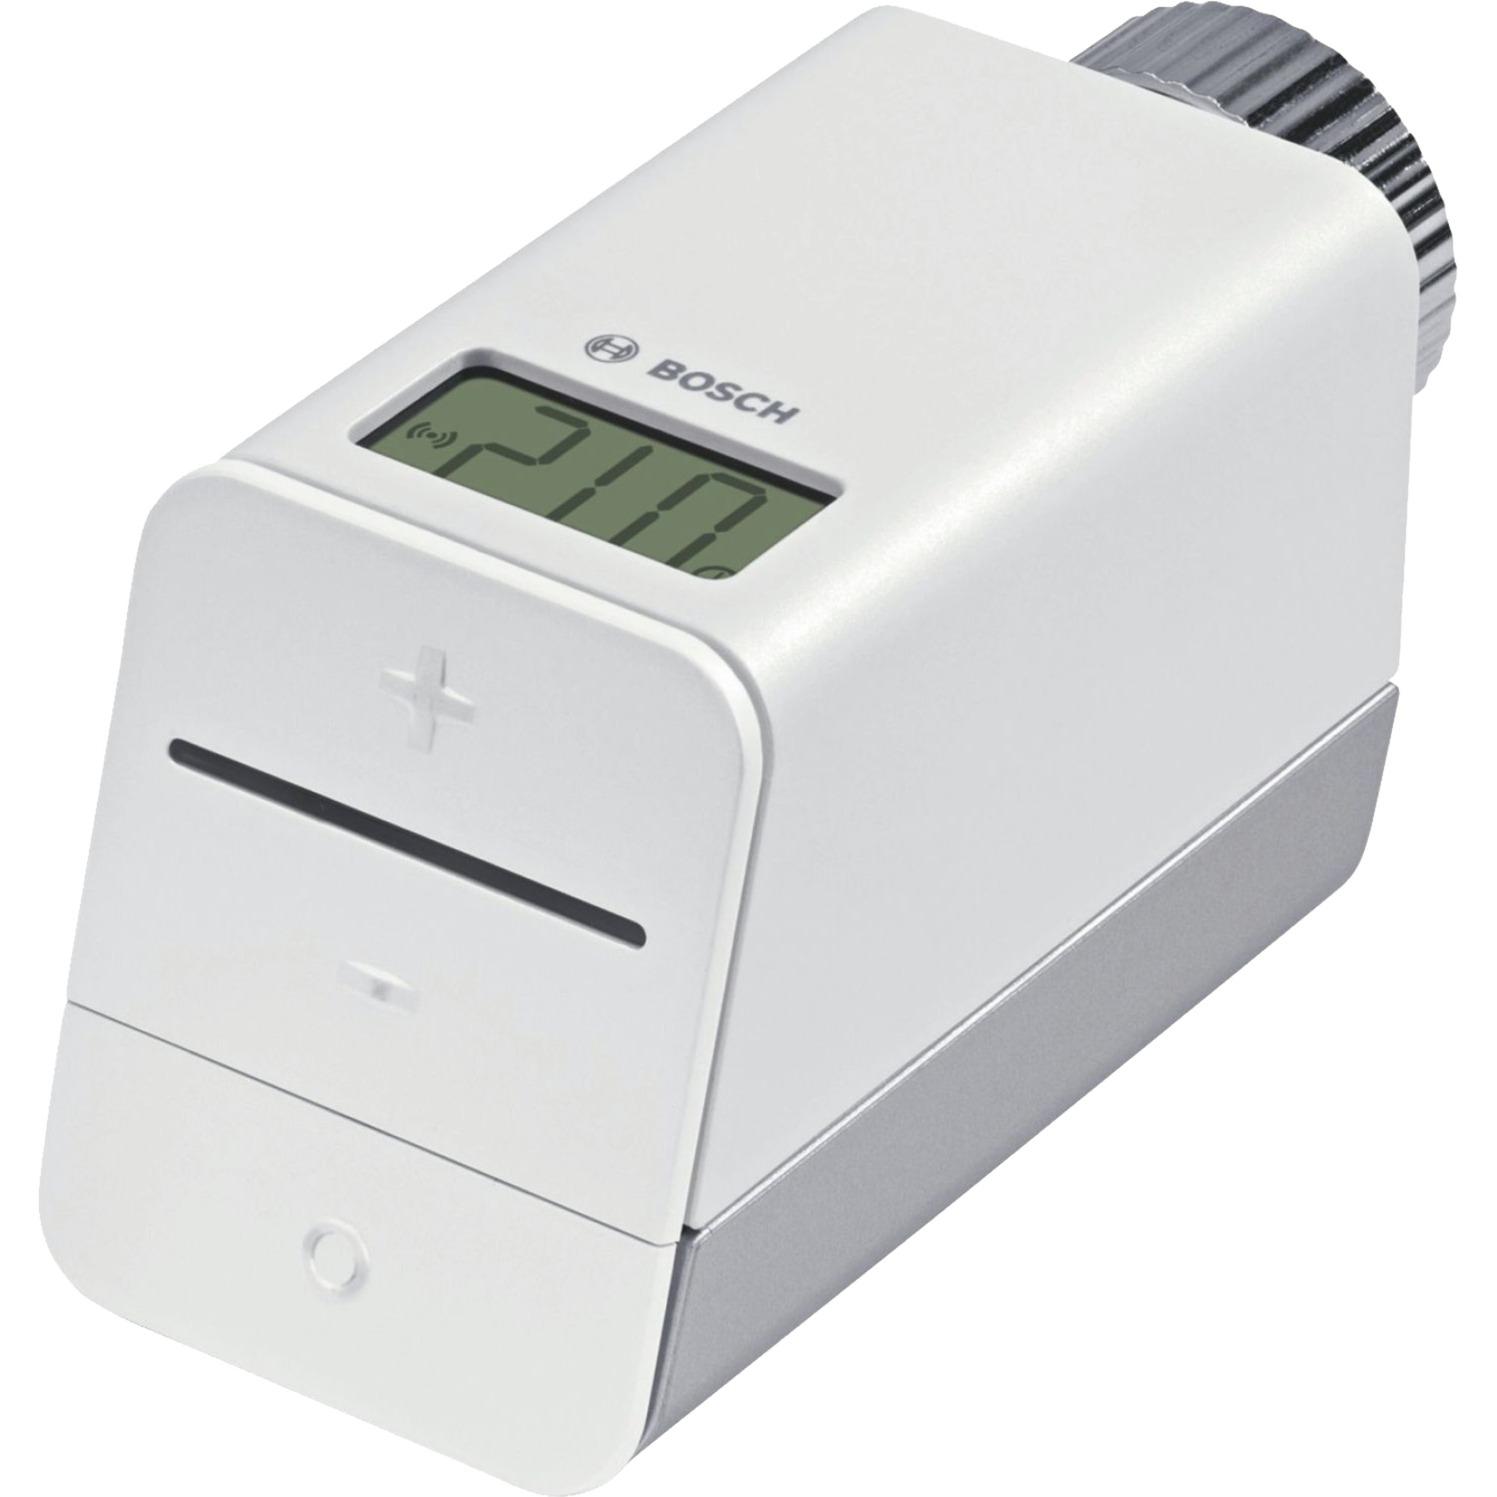 Menred apt 10 termostato ambiente elettronico scatola for Termostato touchscreen gsm vimar 02906